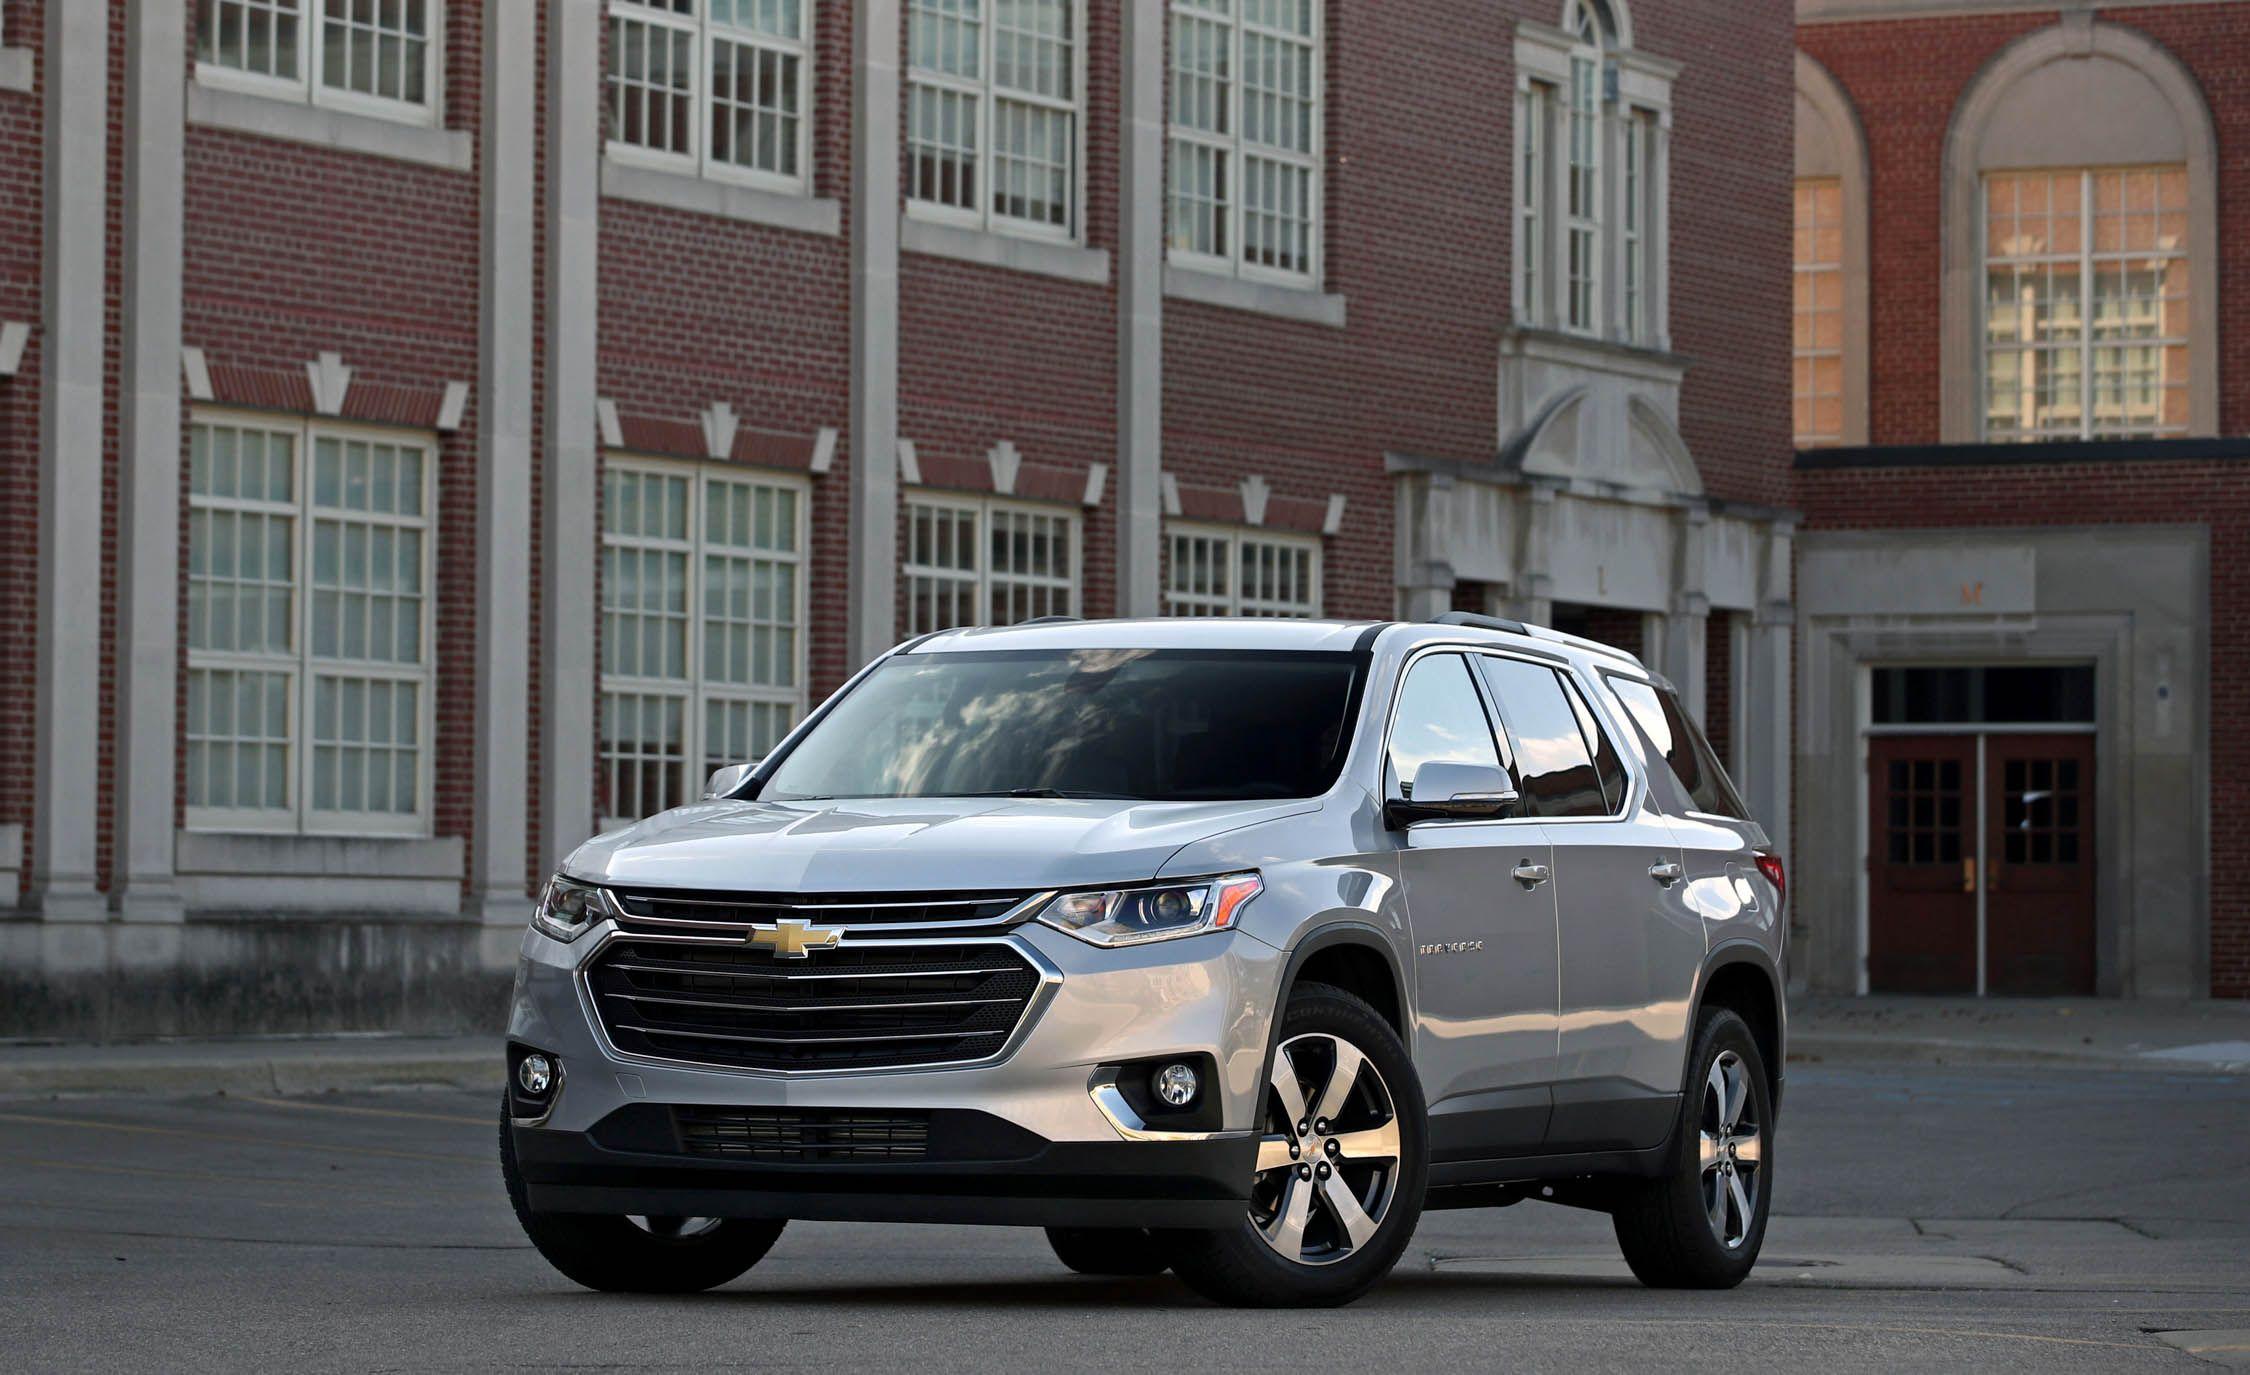 2019 Chevrolet Traverse Reviews Chevrolet Traverse Price Photos